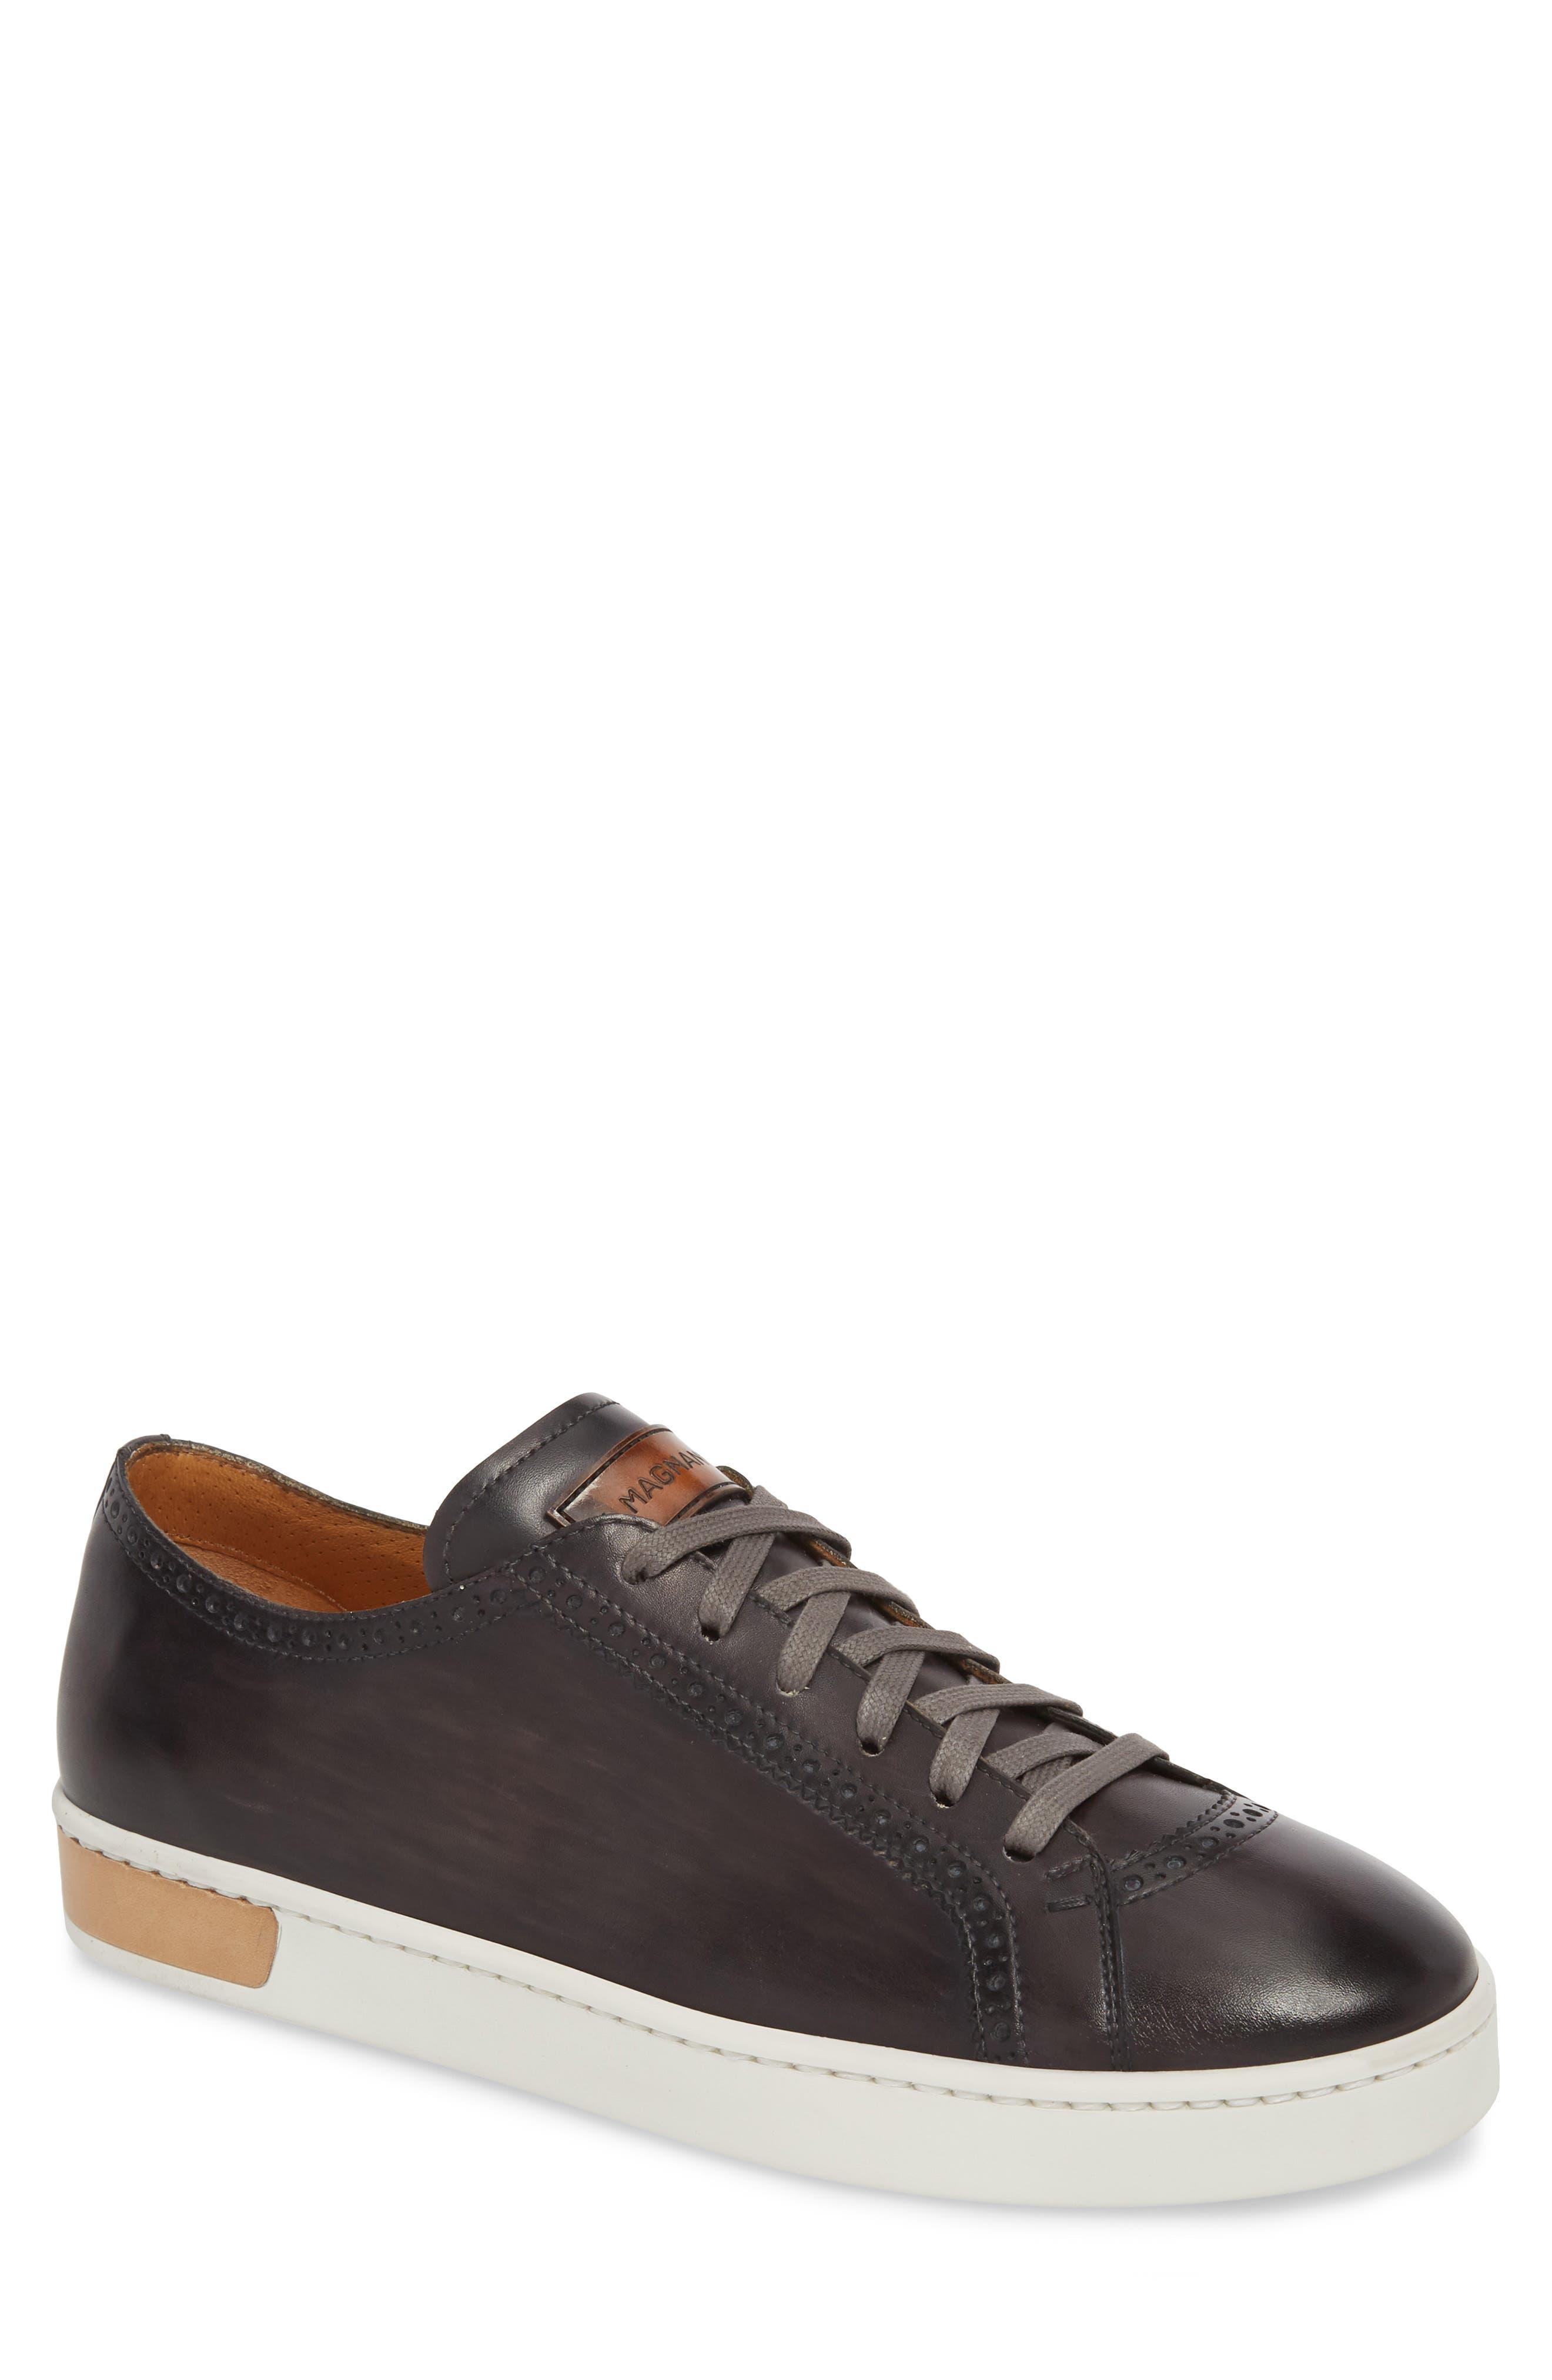 Juniper Brogued Low Top Sneaker,                             Main thumbnail 1, color,                             Grey Leather